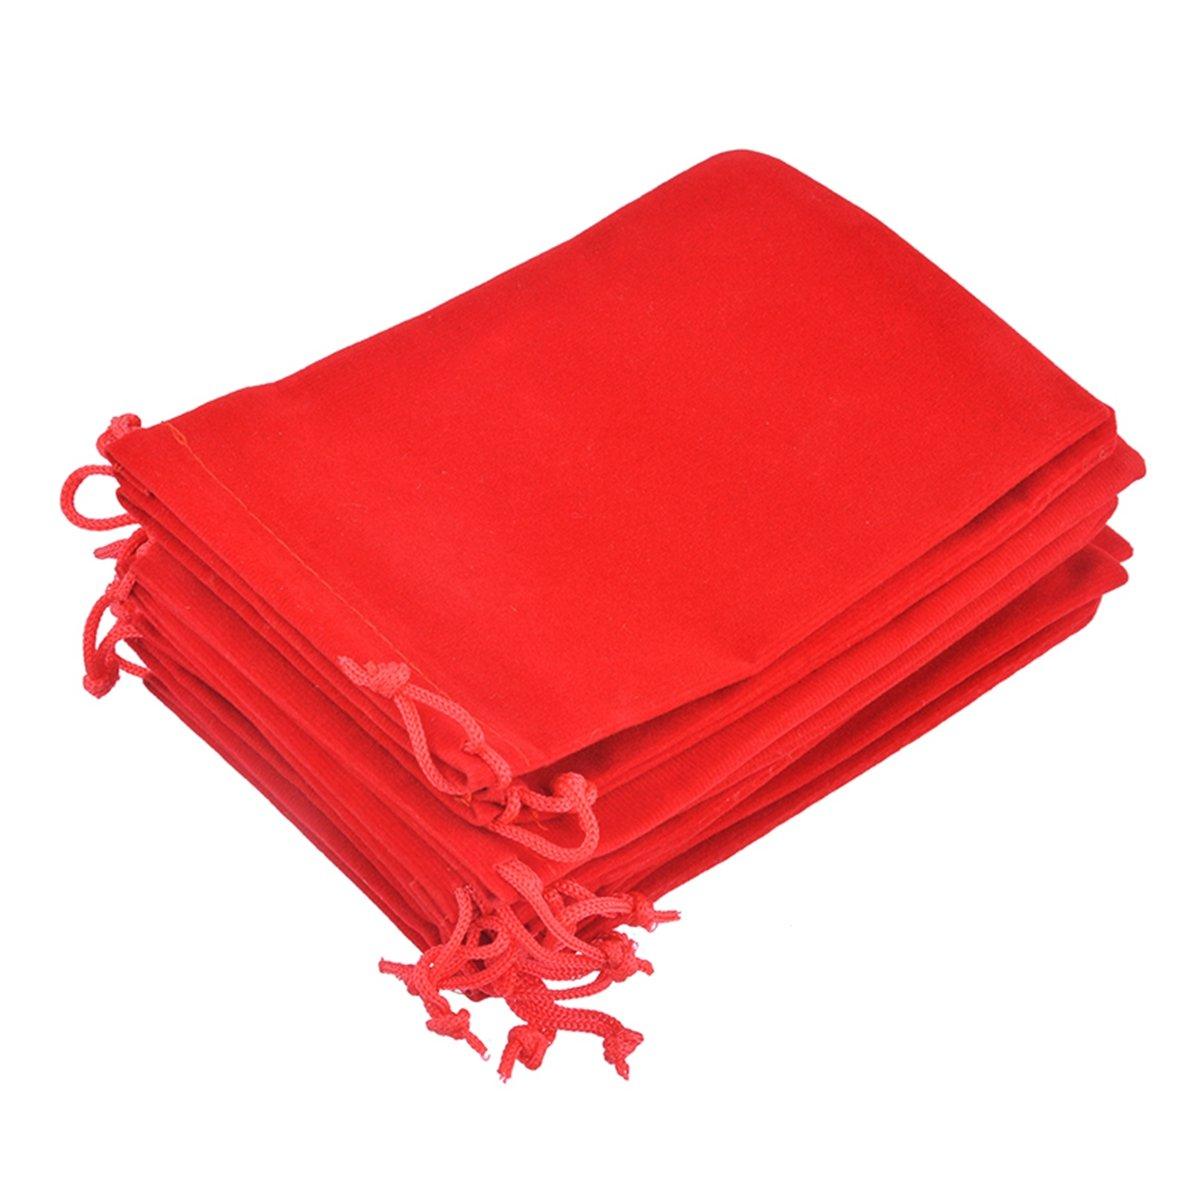 HooAMI Red Velvet Drawstring Pouches Jewelry Gift Bags 10pcs, 15x10cm